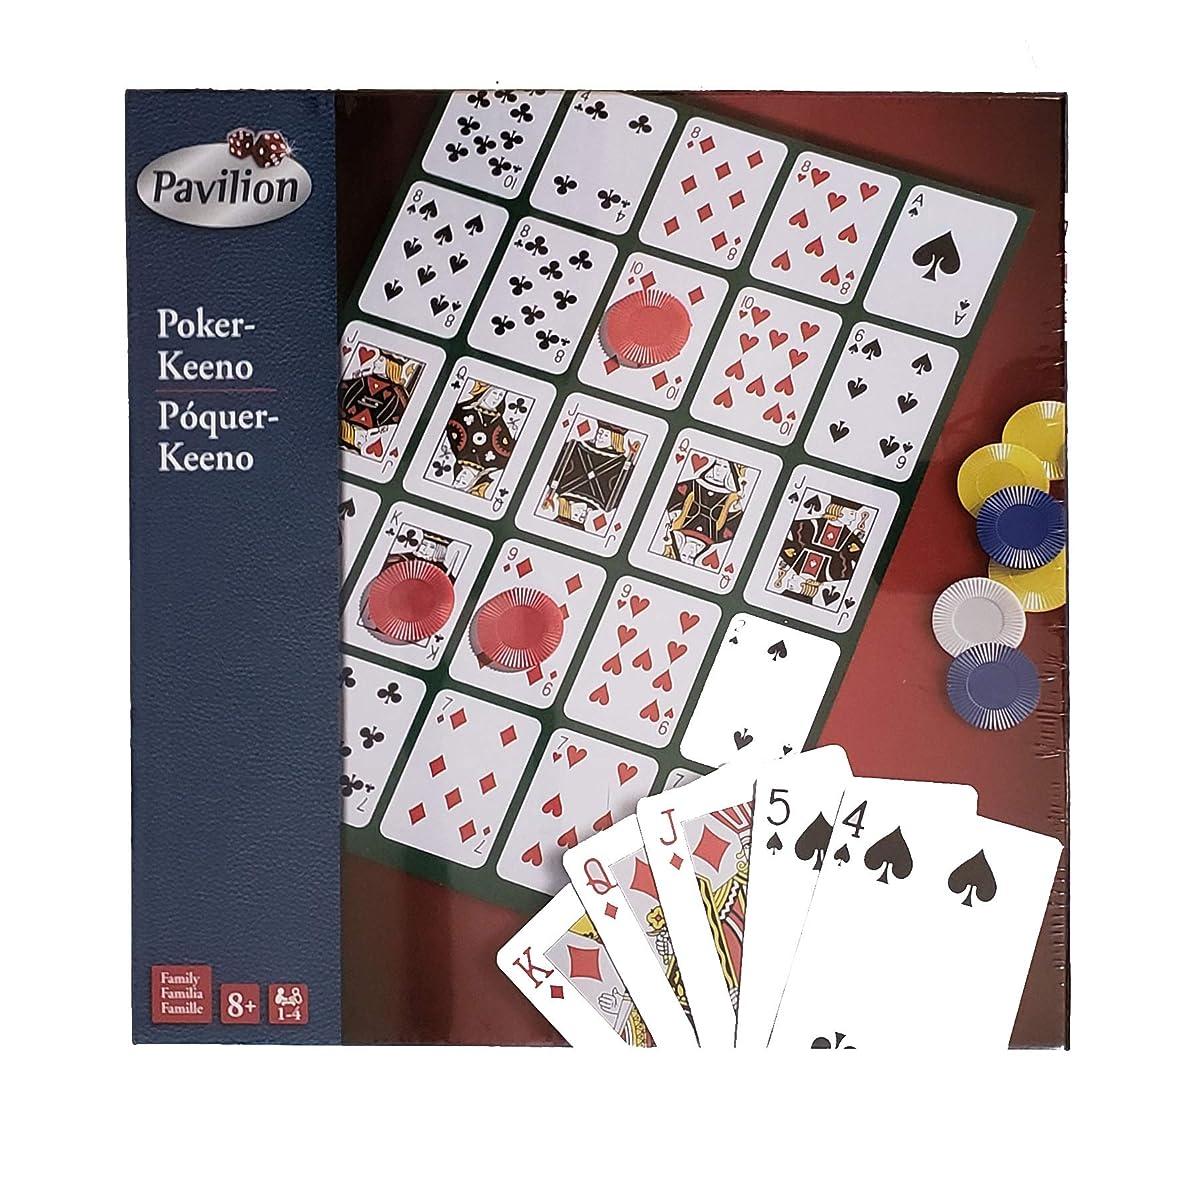 Pavilion Games: Poker-Keeno